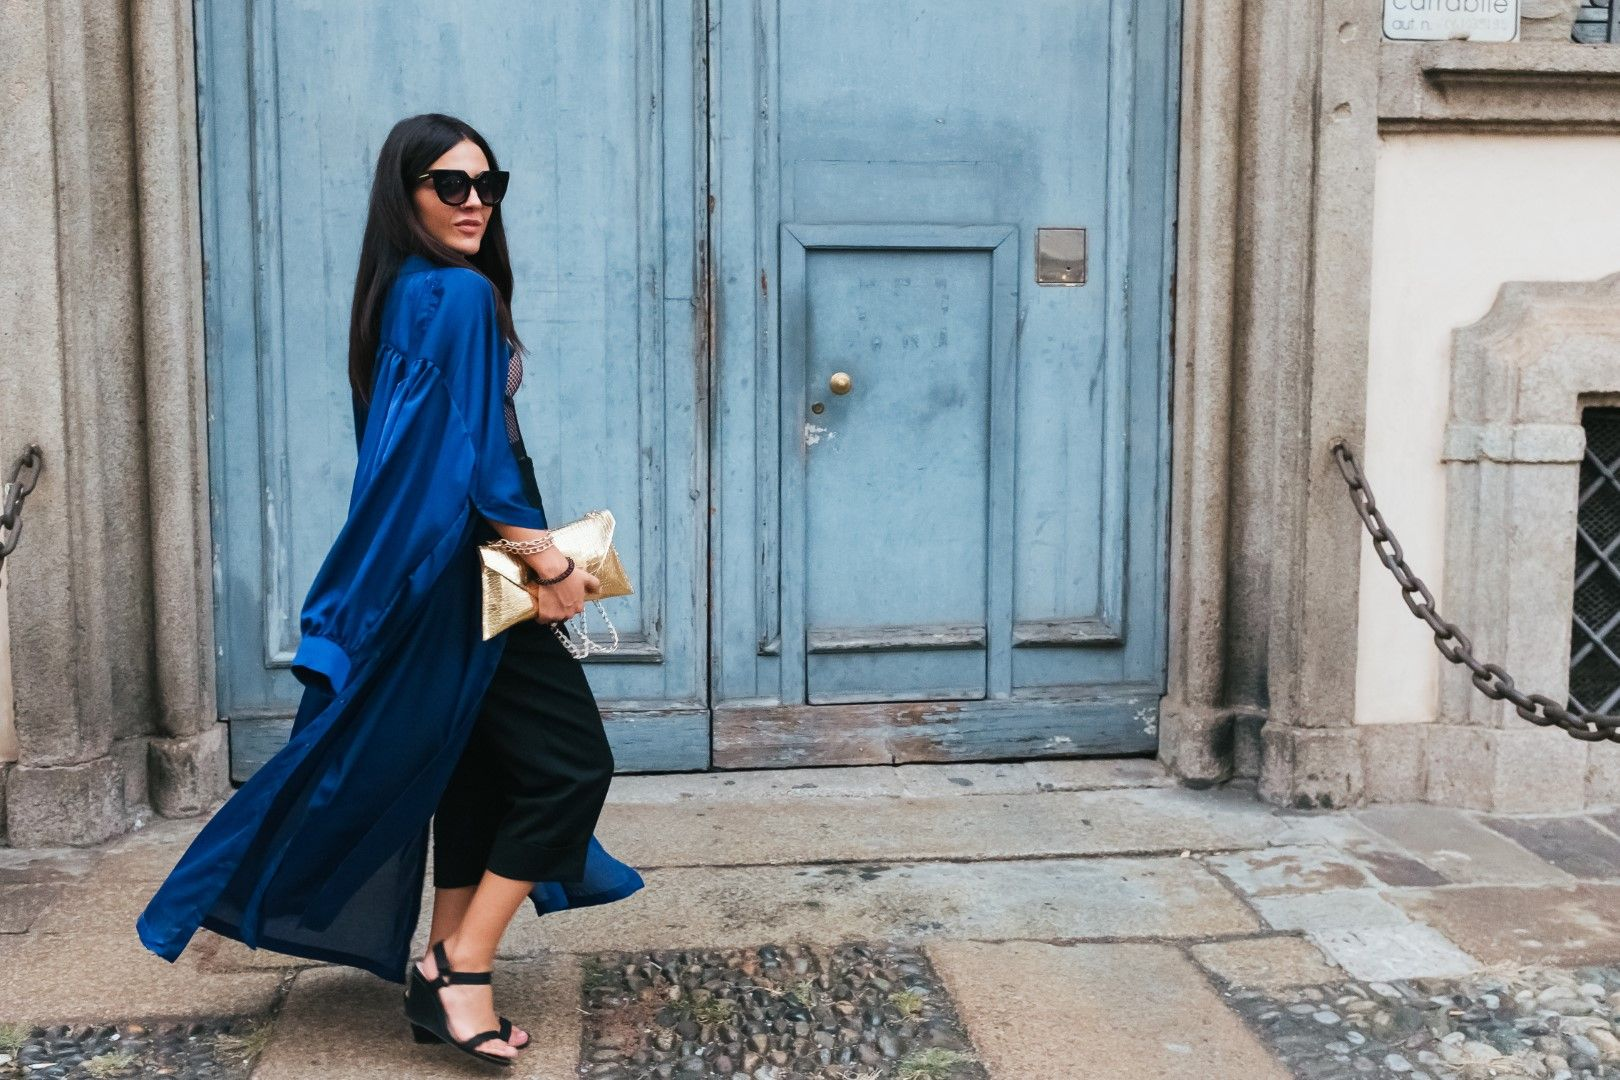 Глория Димитрова в Милано (Снимка: Carlo Lanteri)